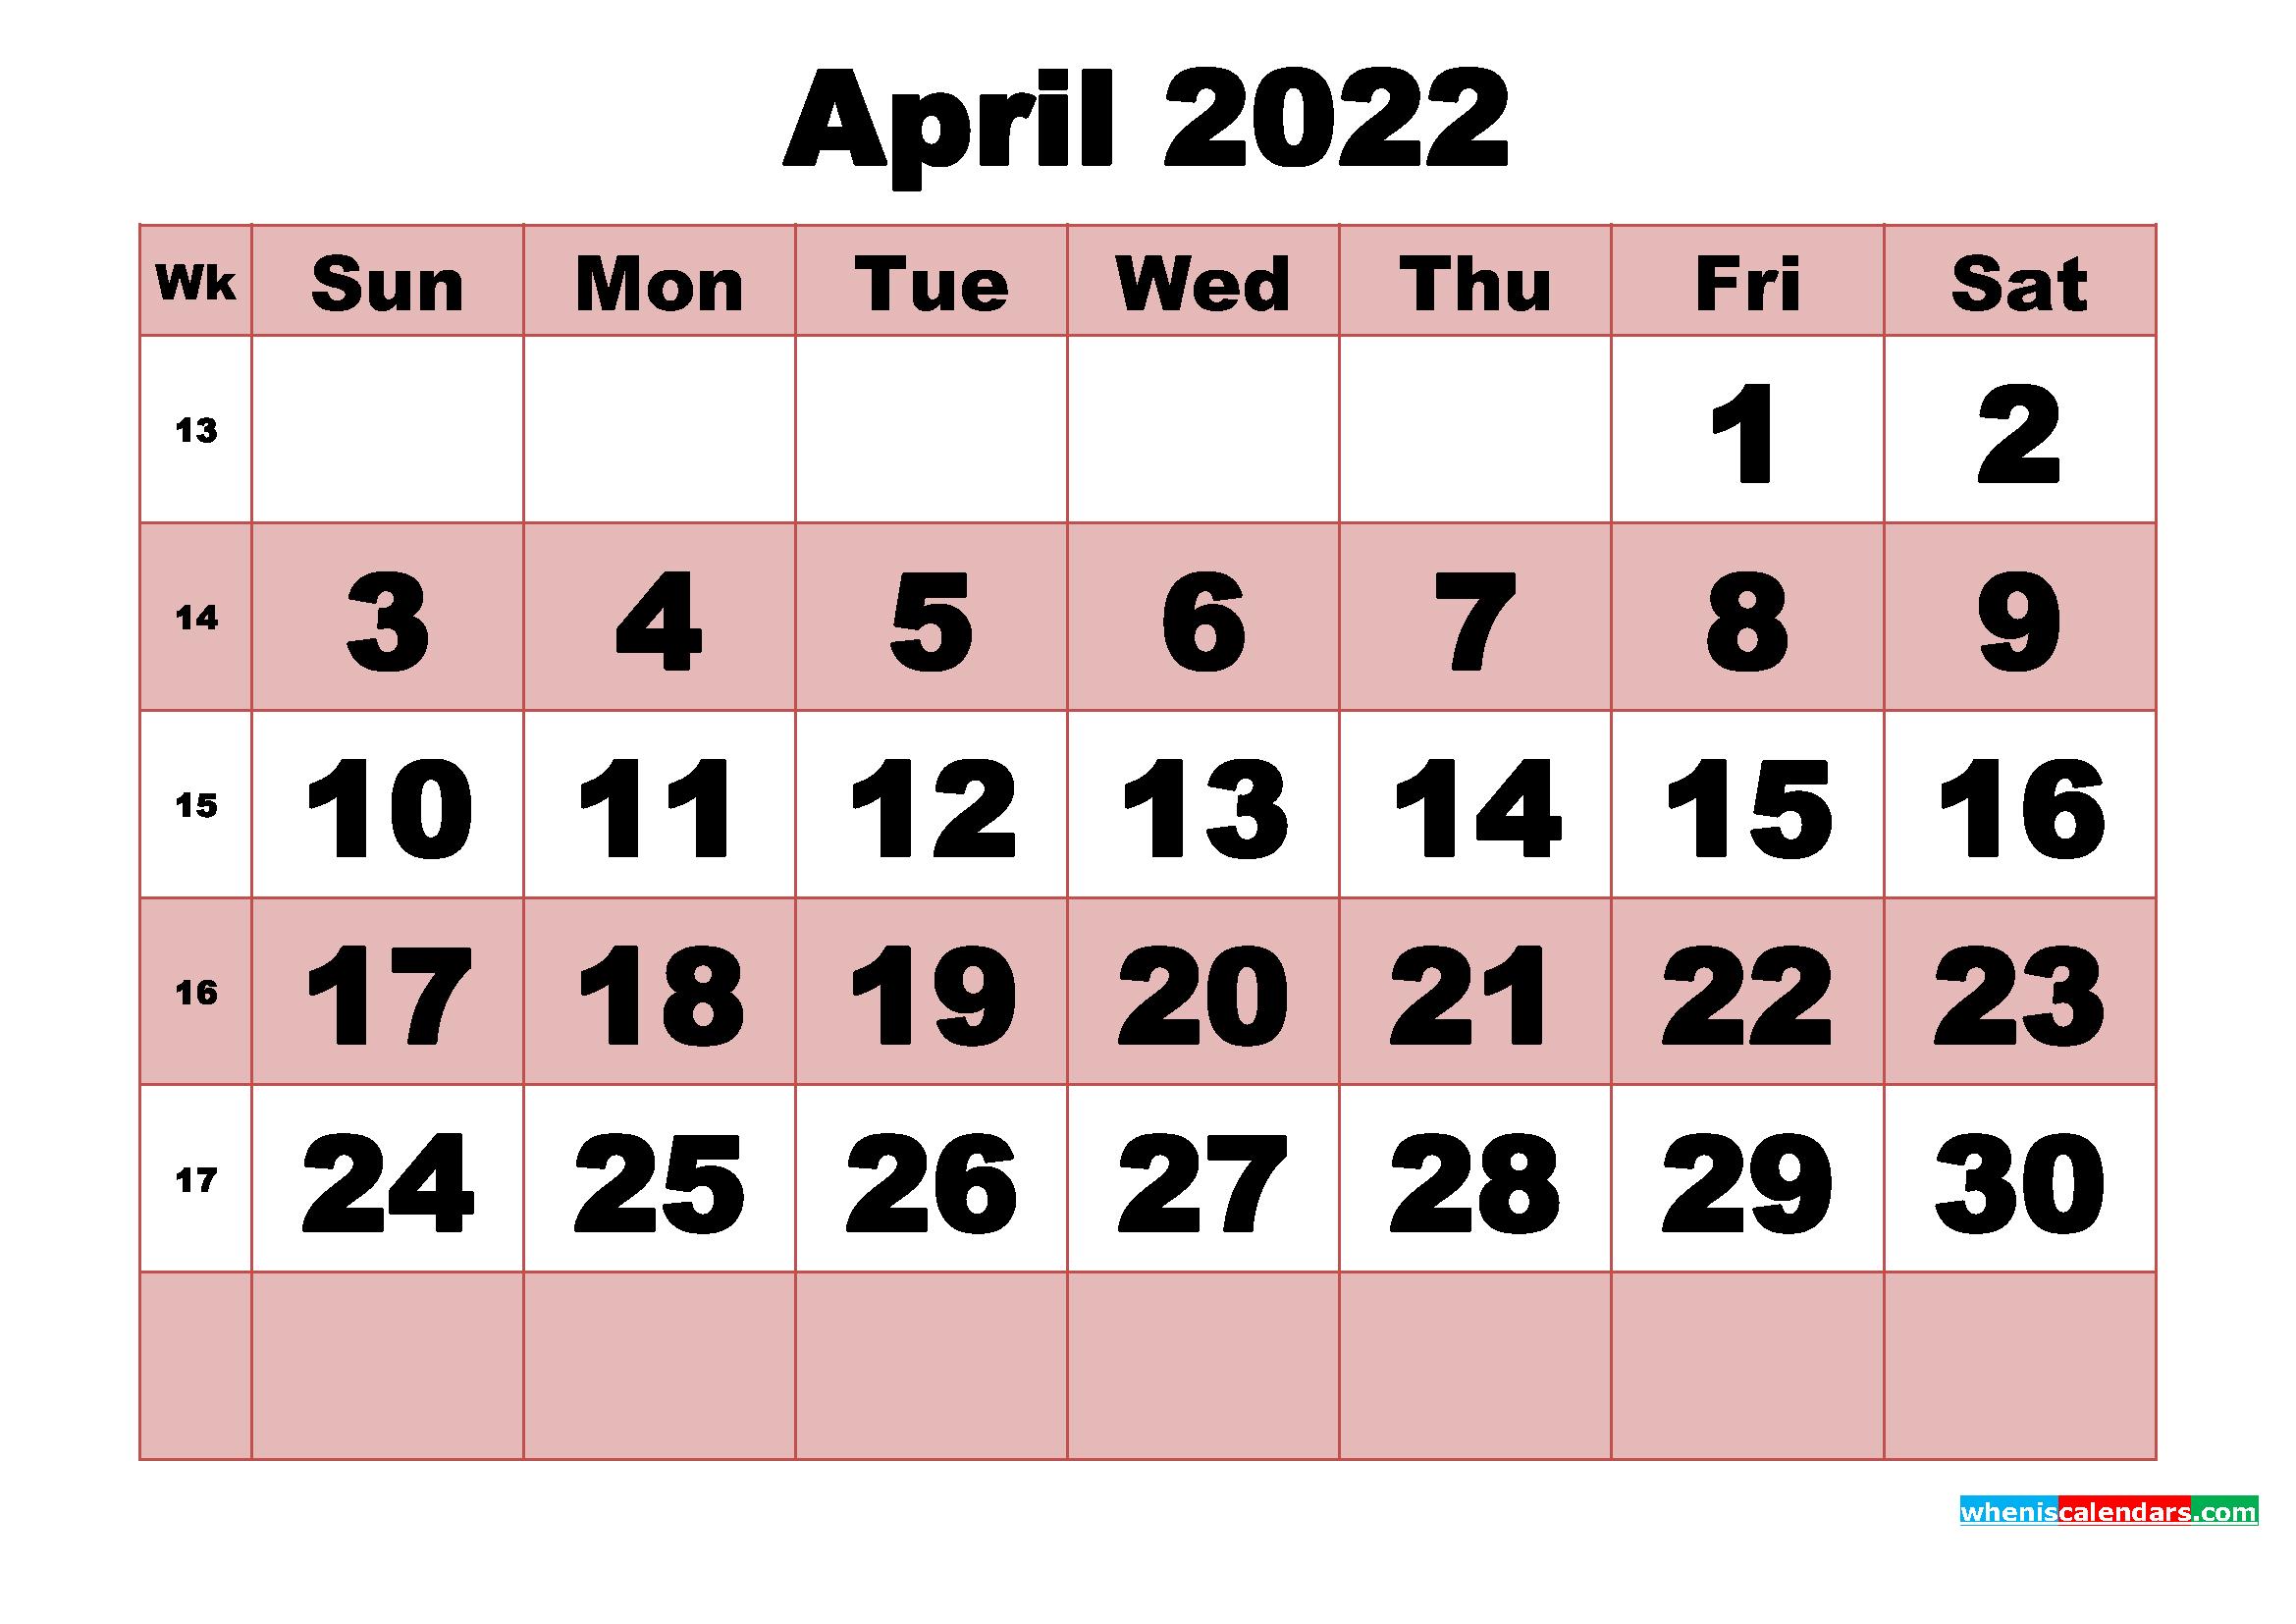 Free Printable Monthly Calendar April 2022 in April 2022 Calendar Printable Photo